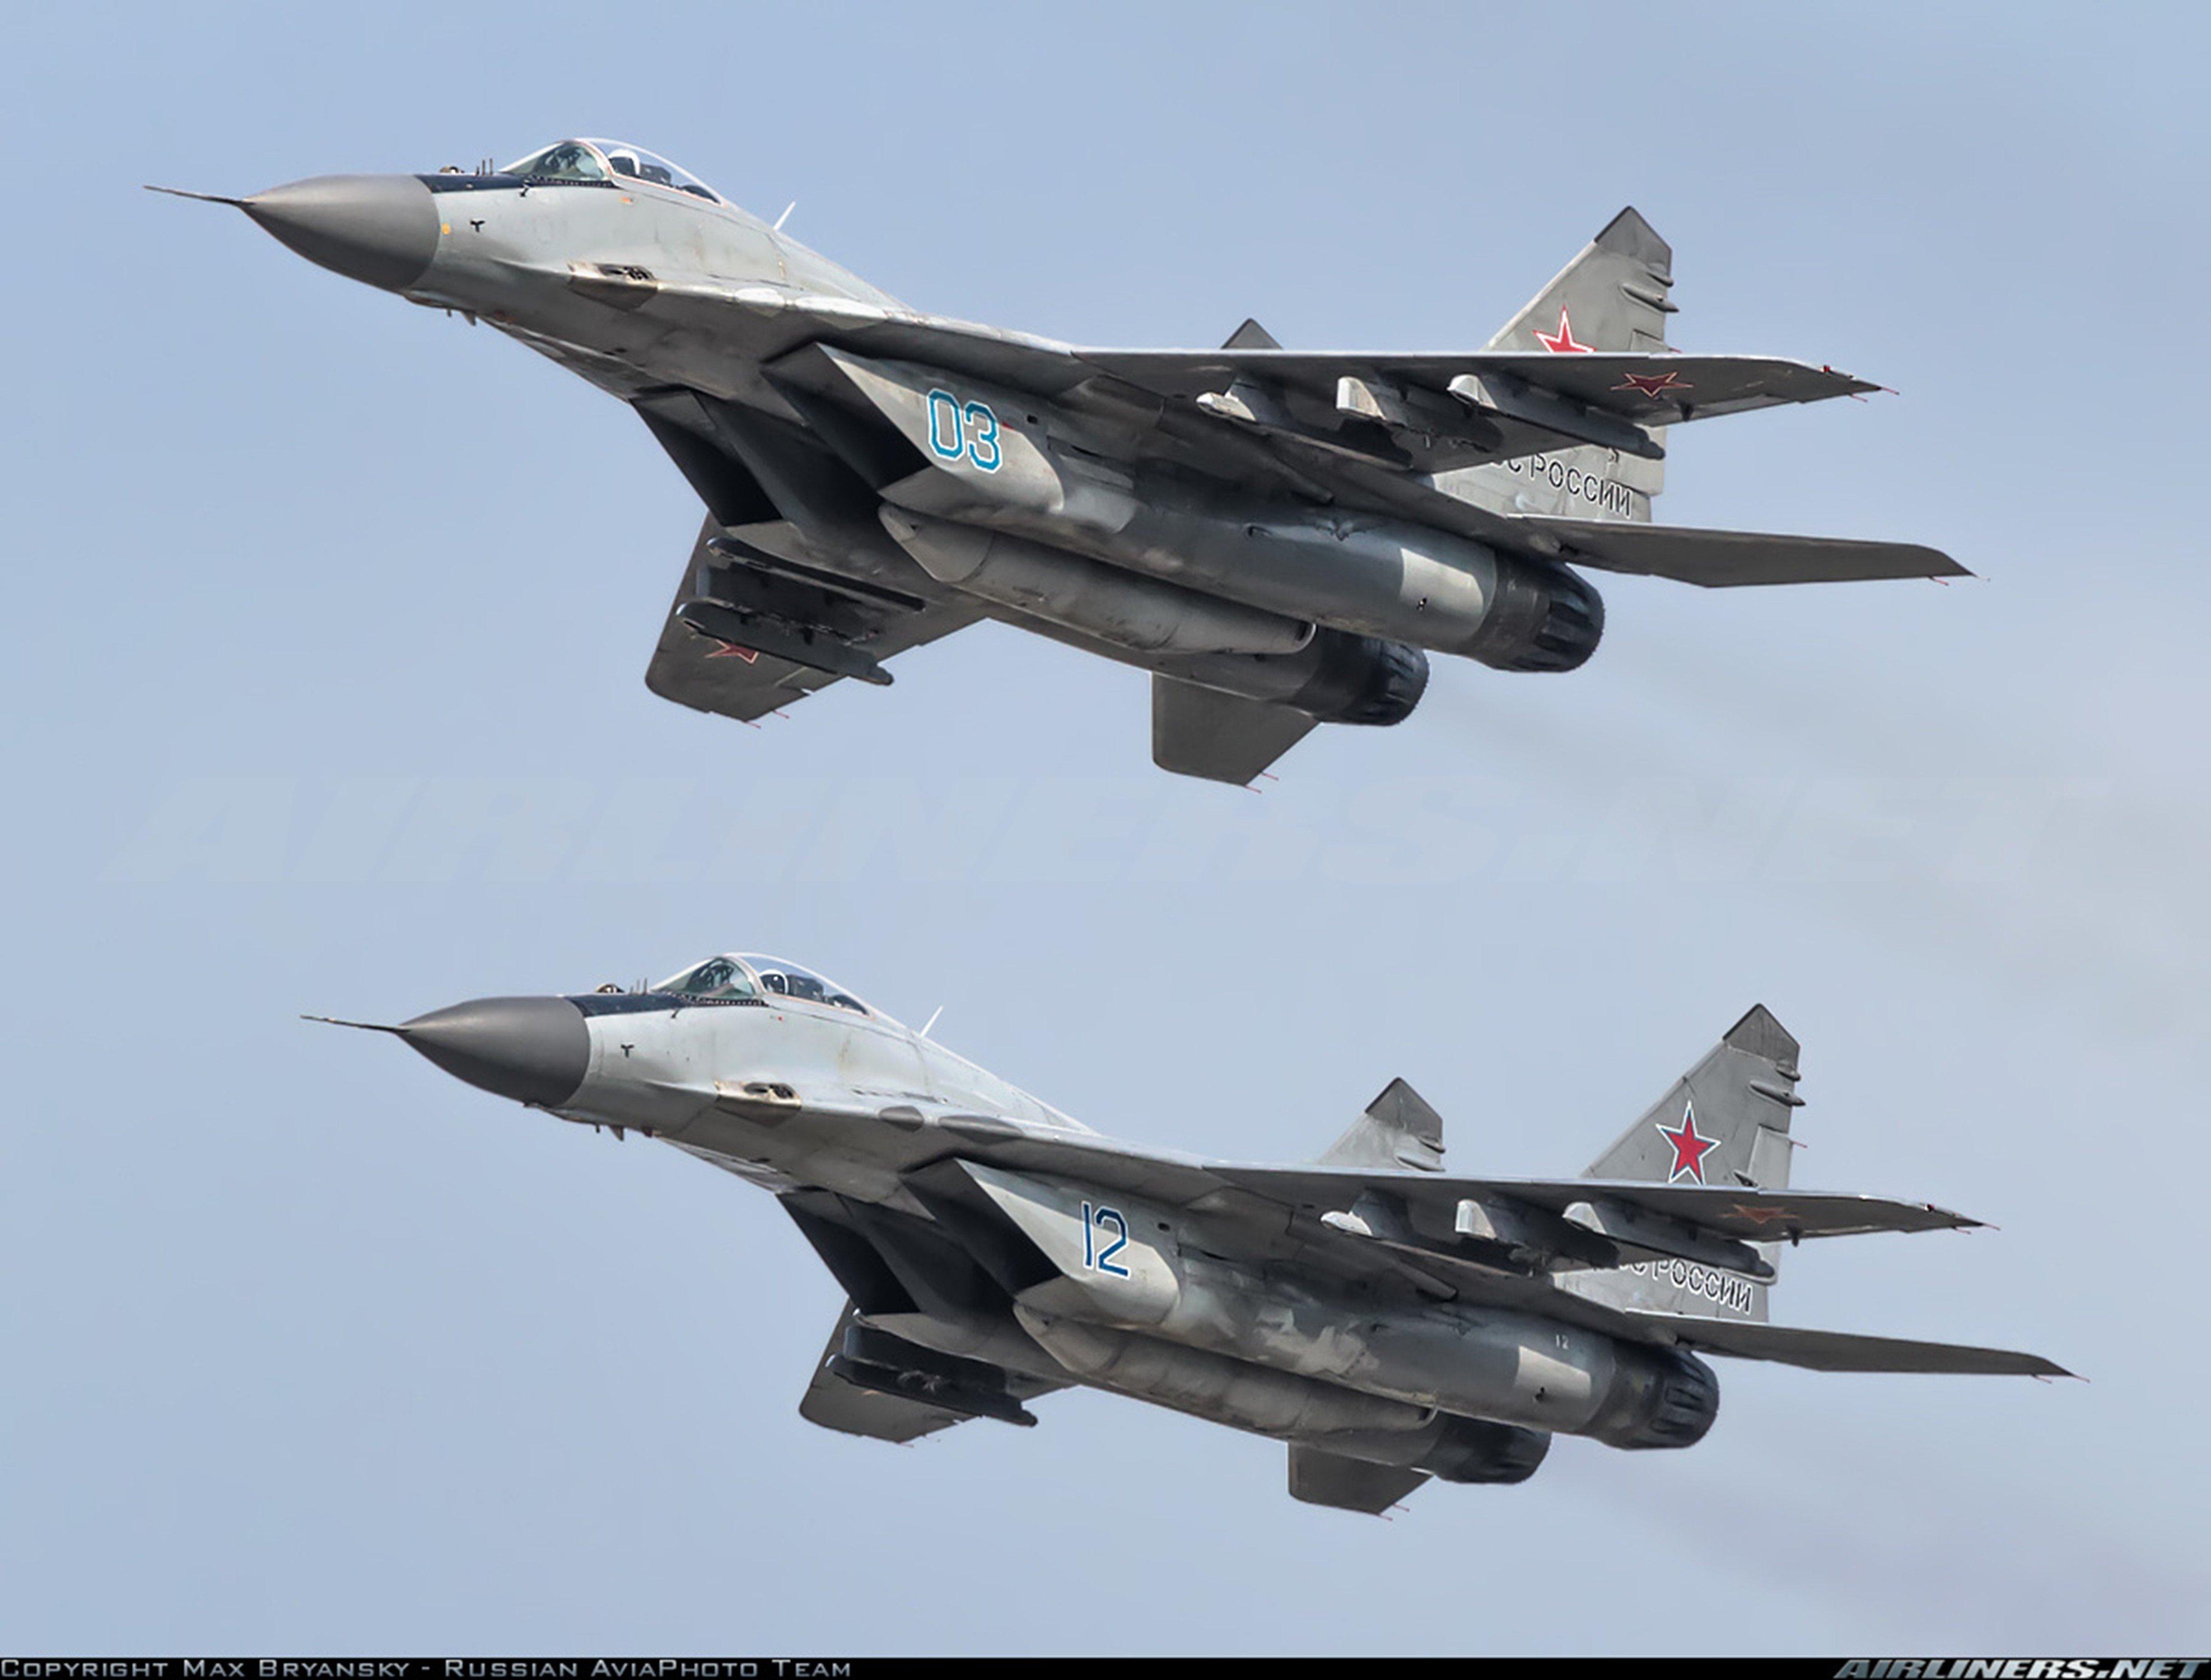 Mikoyan Gurevich MiG Russia Jet Fighter Russian Air Force Aircraft War Sky Red Star 29 Wallpaper